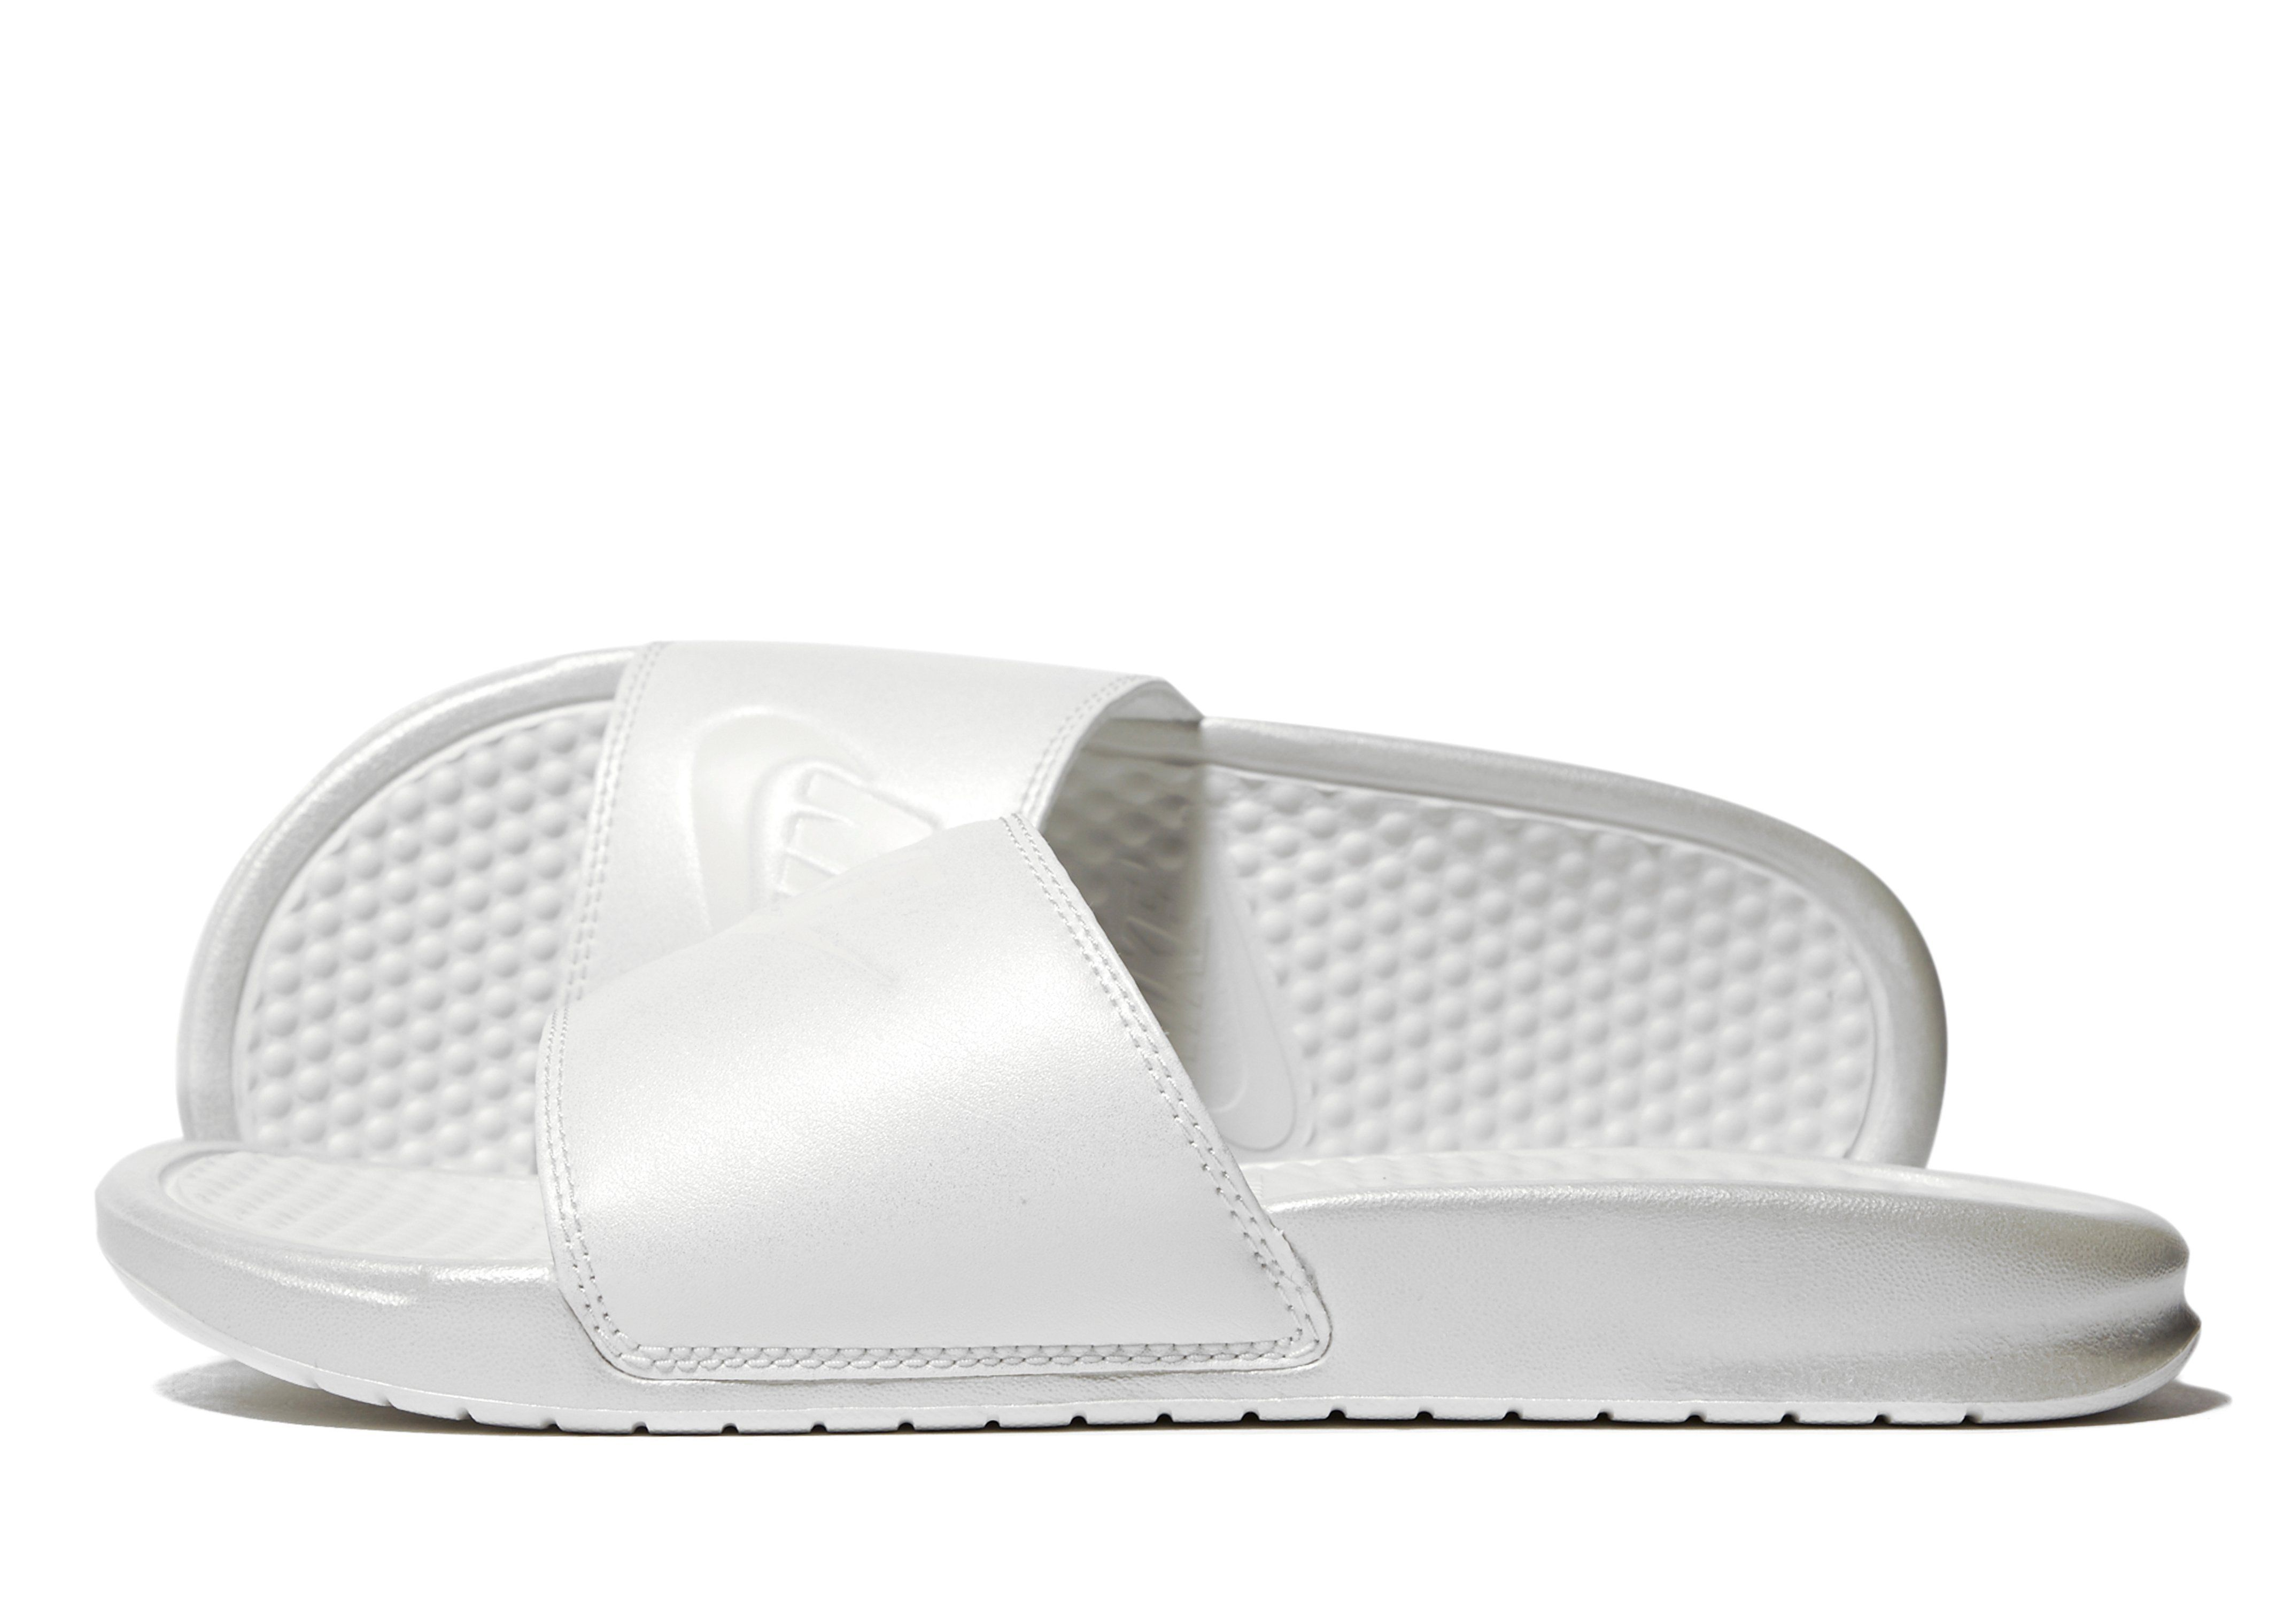 Disgusto filete preparar  Nike Benassi Slides Women's - Shop online for Nike Benassi Slides Women's  with JD Sports, the UK's leading sports fashion retailer.